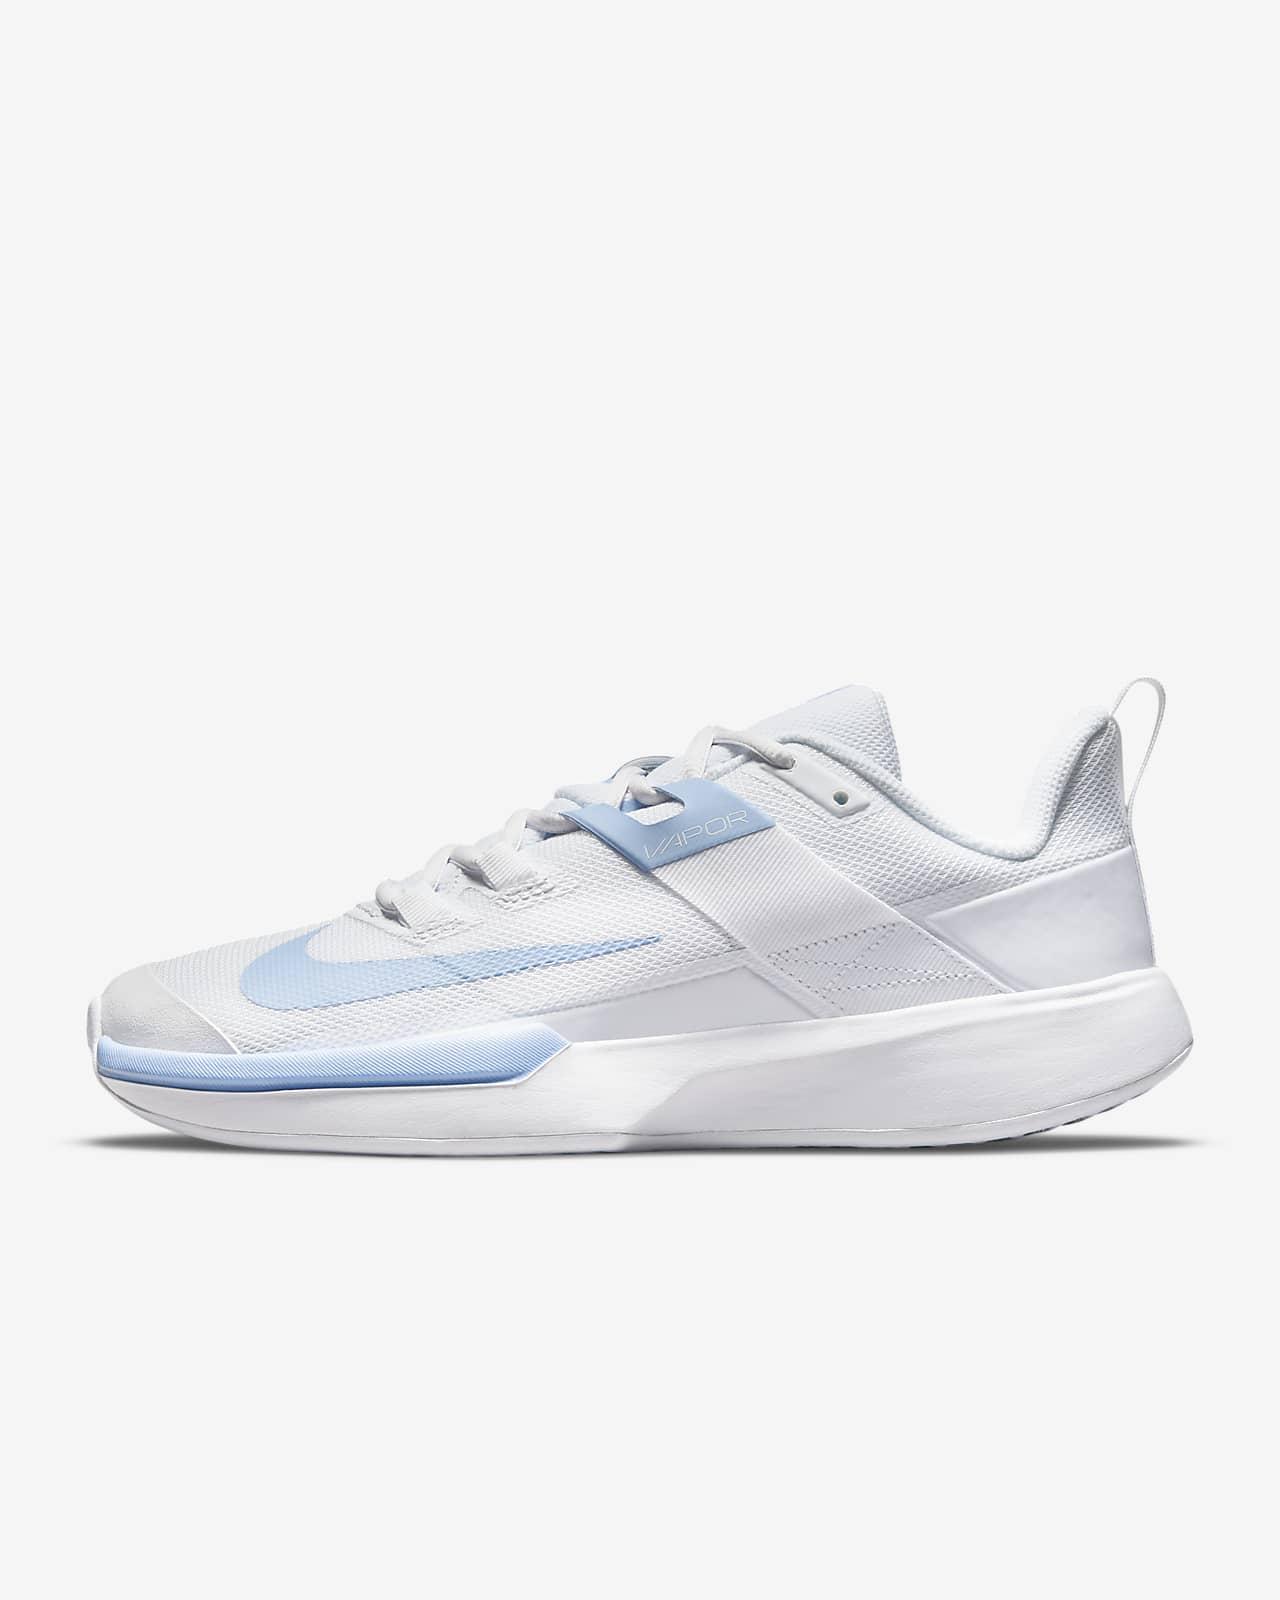 NikeCourt Vapor Lite Women's Hard-Court Tennis Shoe